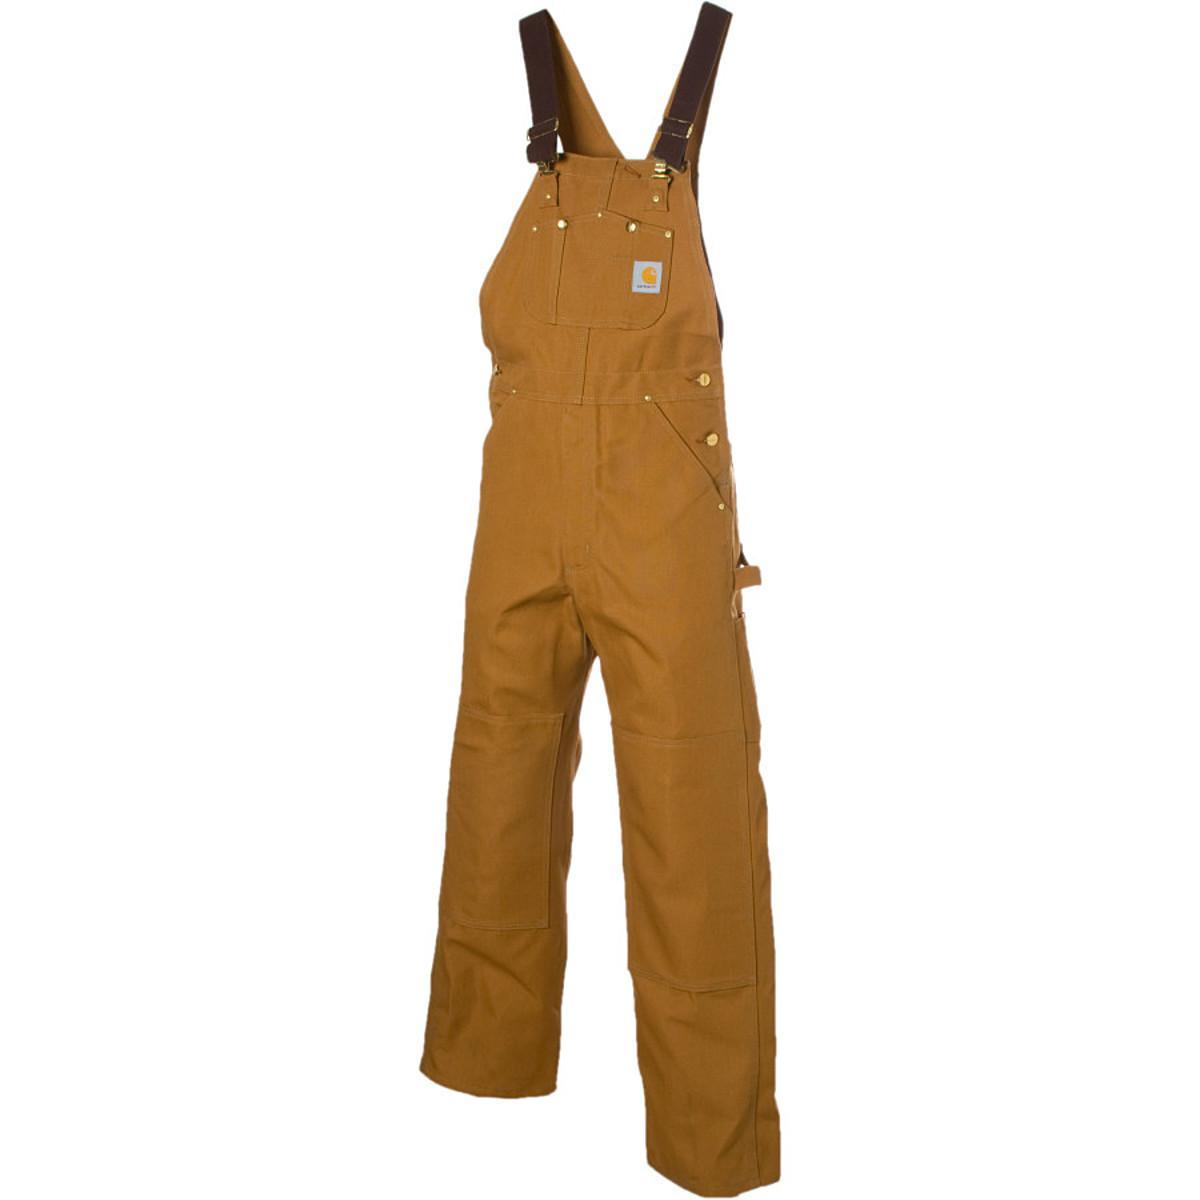 8129c790b6 Lyst - Carhartt Duck Bib Overall Pant in Brown for Men